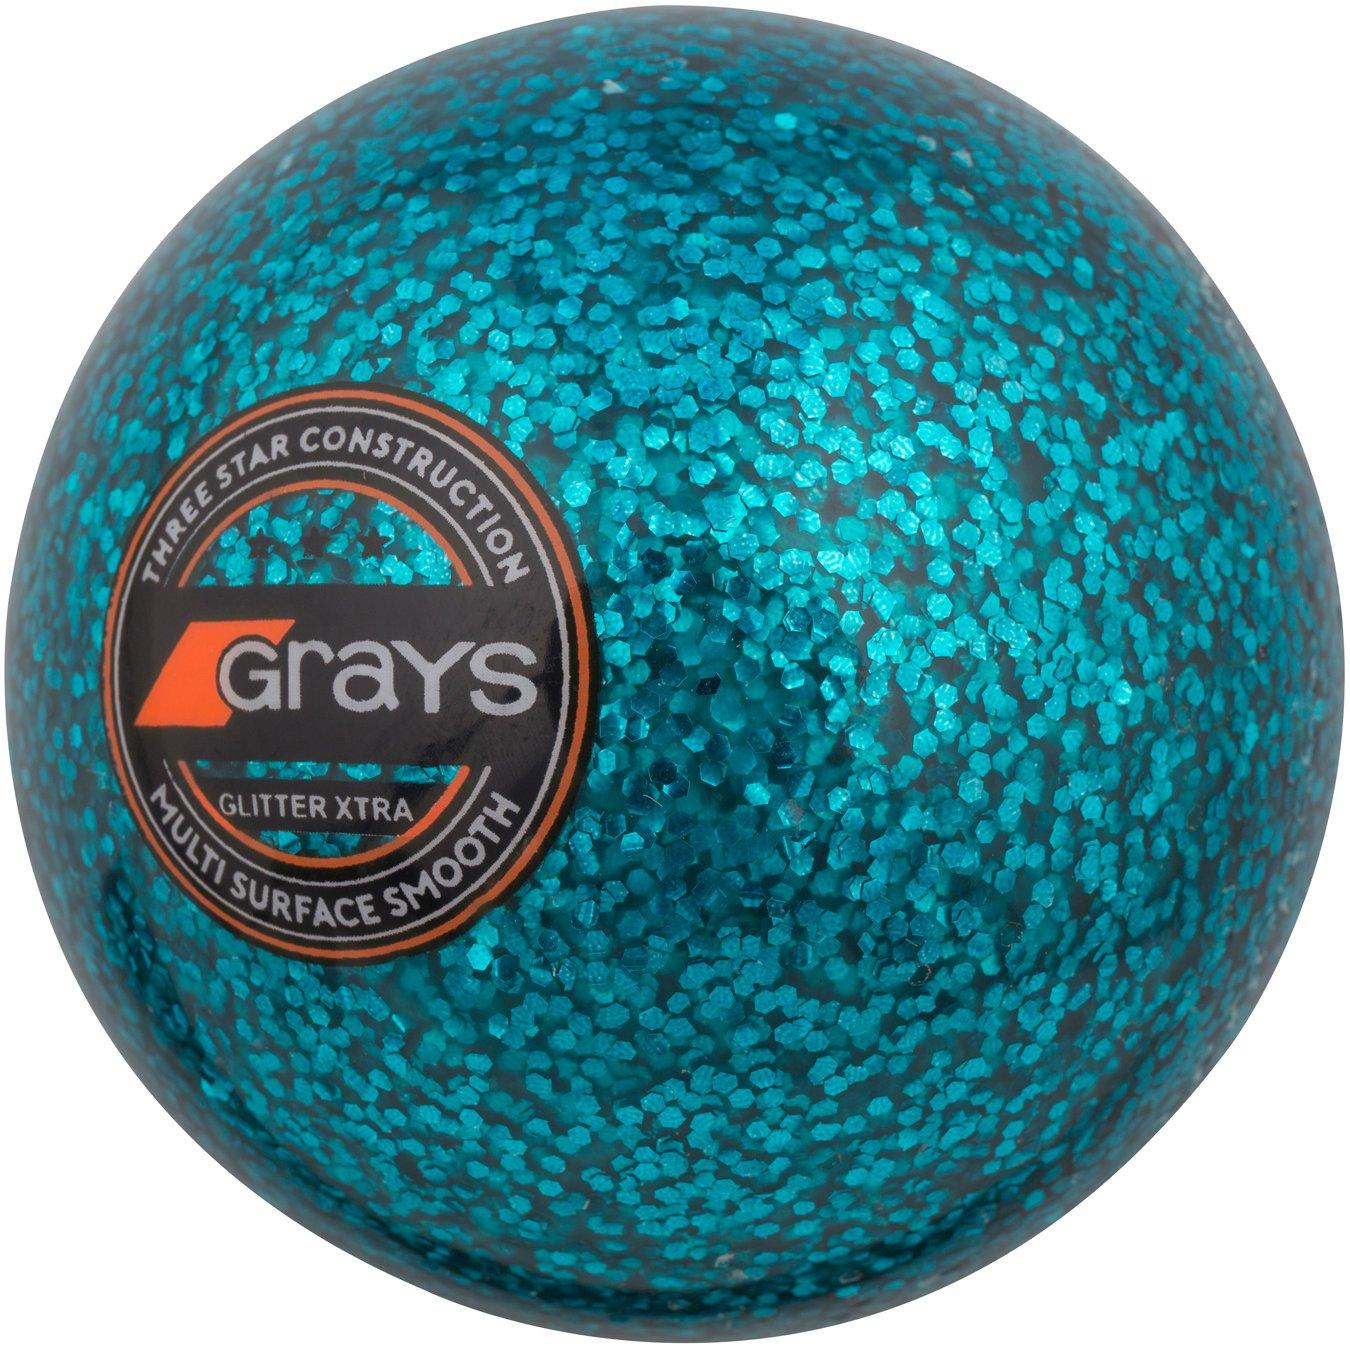 GRAYS Glitter Xtra Ball Einheitsgröße 645002